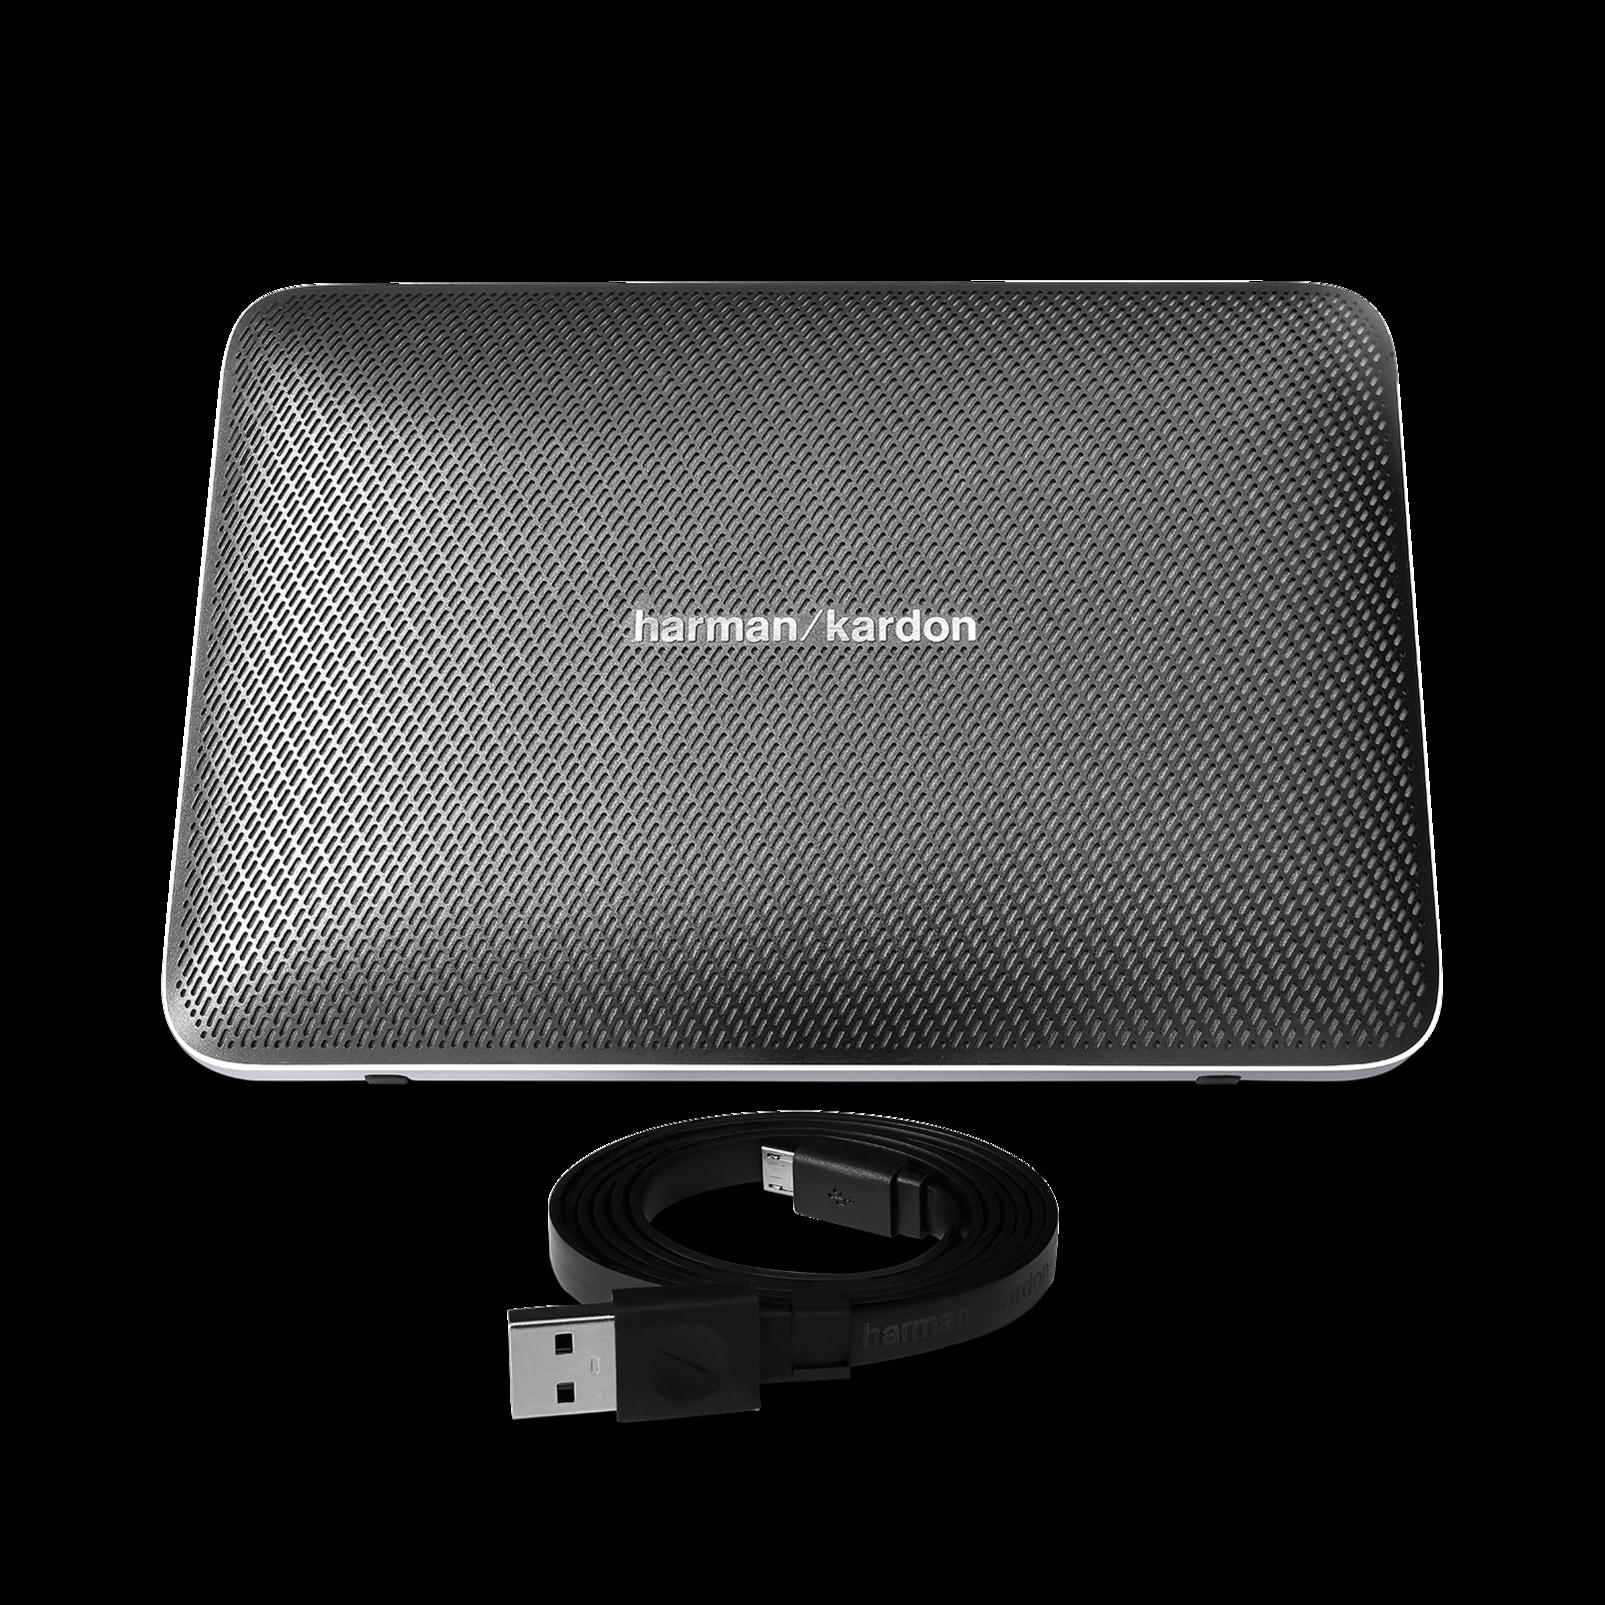 Esquire 2 - Grey - Premium portable Bluetooth speaker with quad microphone conferencing system - Detailshot 2